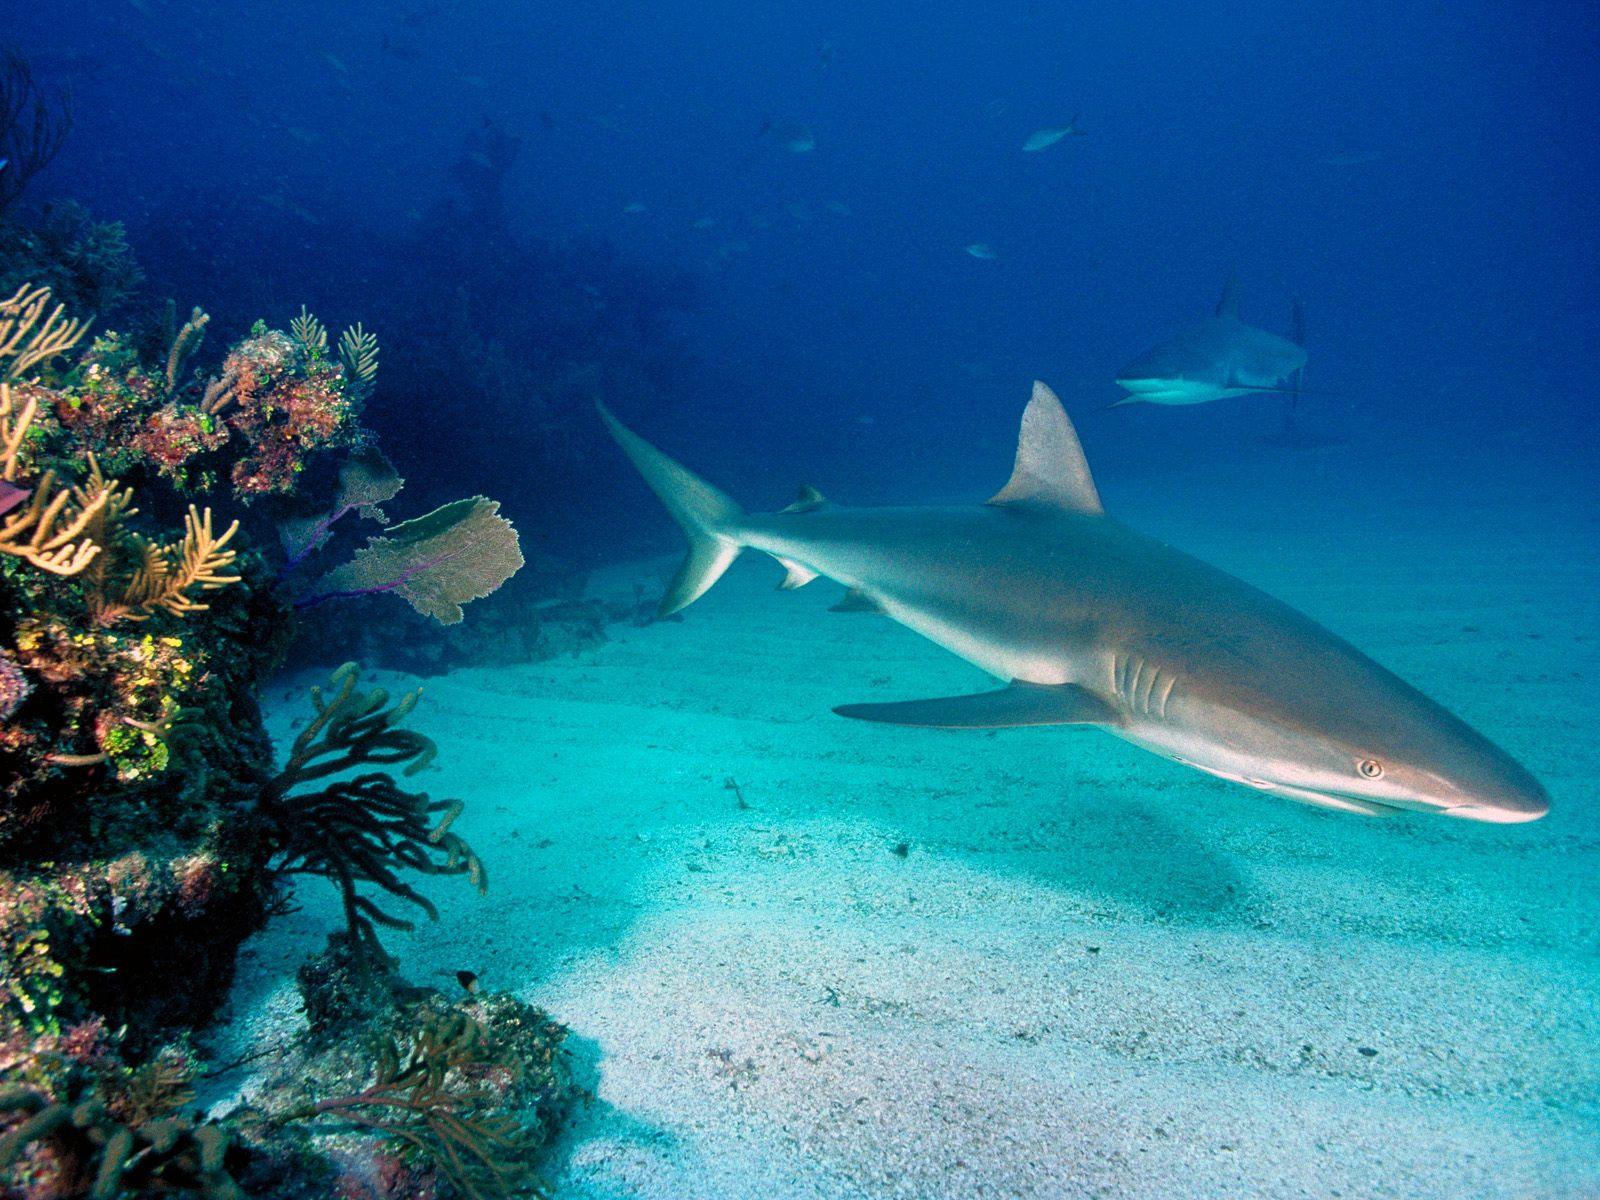 http://2.bp.blogspot.com/-Q_7WC4BCxAA/TkrLamrLxcI/AAAAAAAALjo/7VRQFXNLMoA/s1600/Underwater+Wallpapers+%25286%2529.jpg